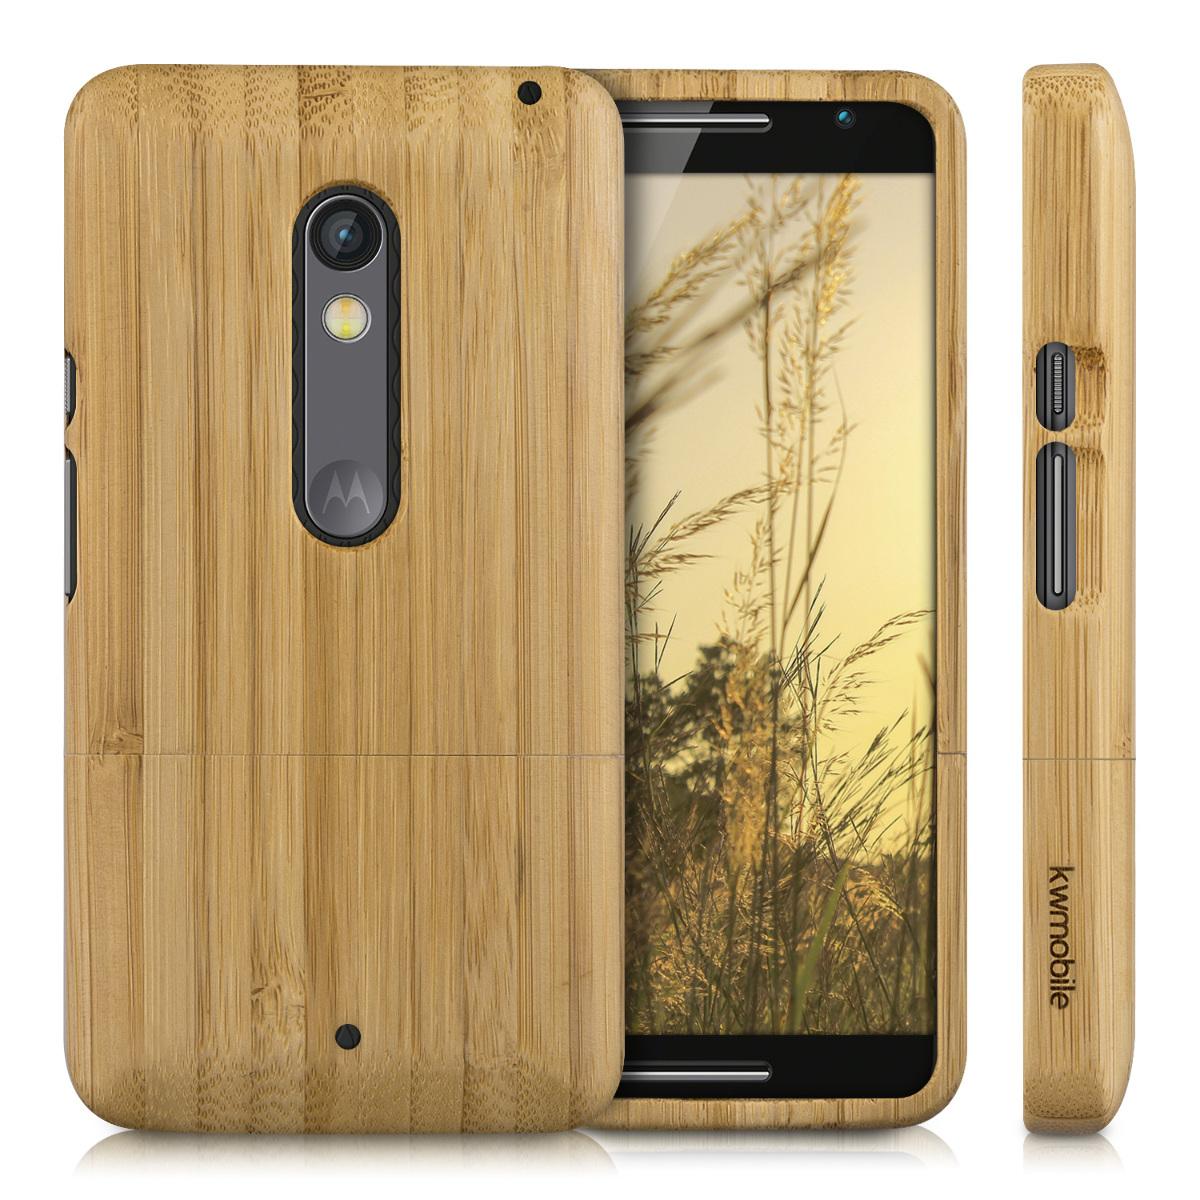 motorola x play. wood-cover-for-motorola-moto-x-play-bamboo- motorola x play